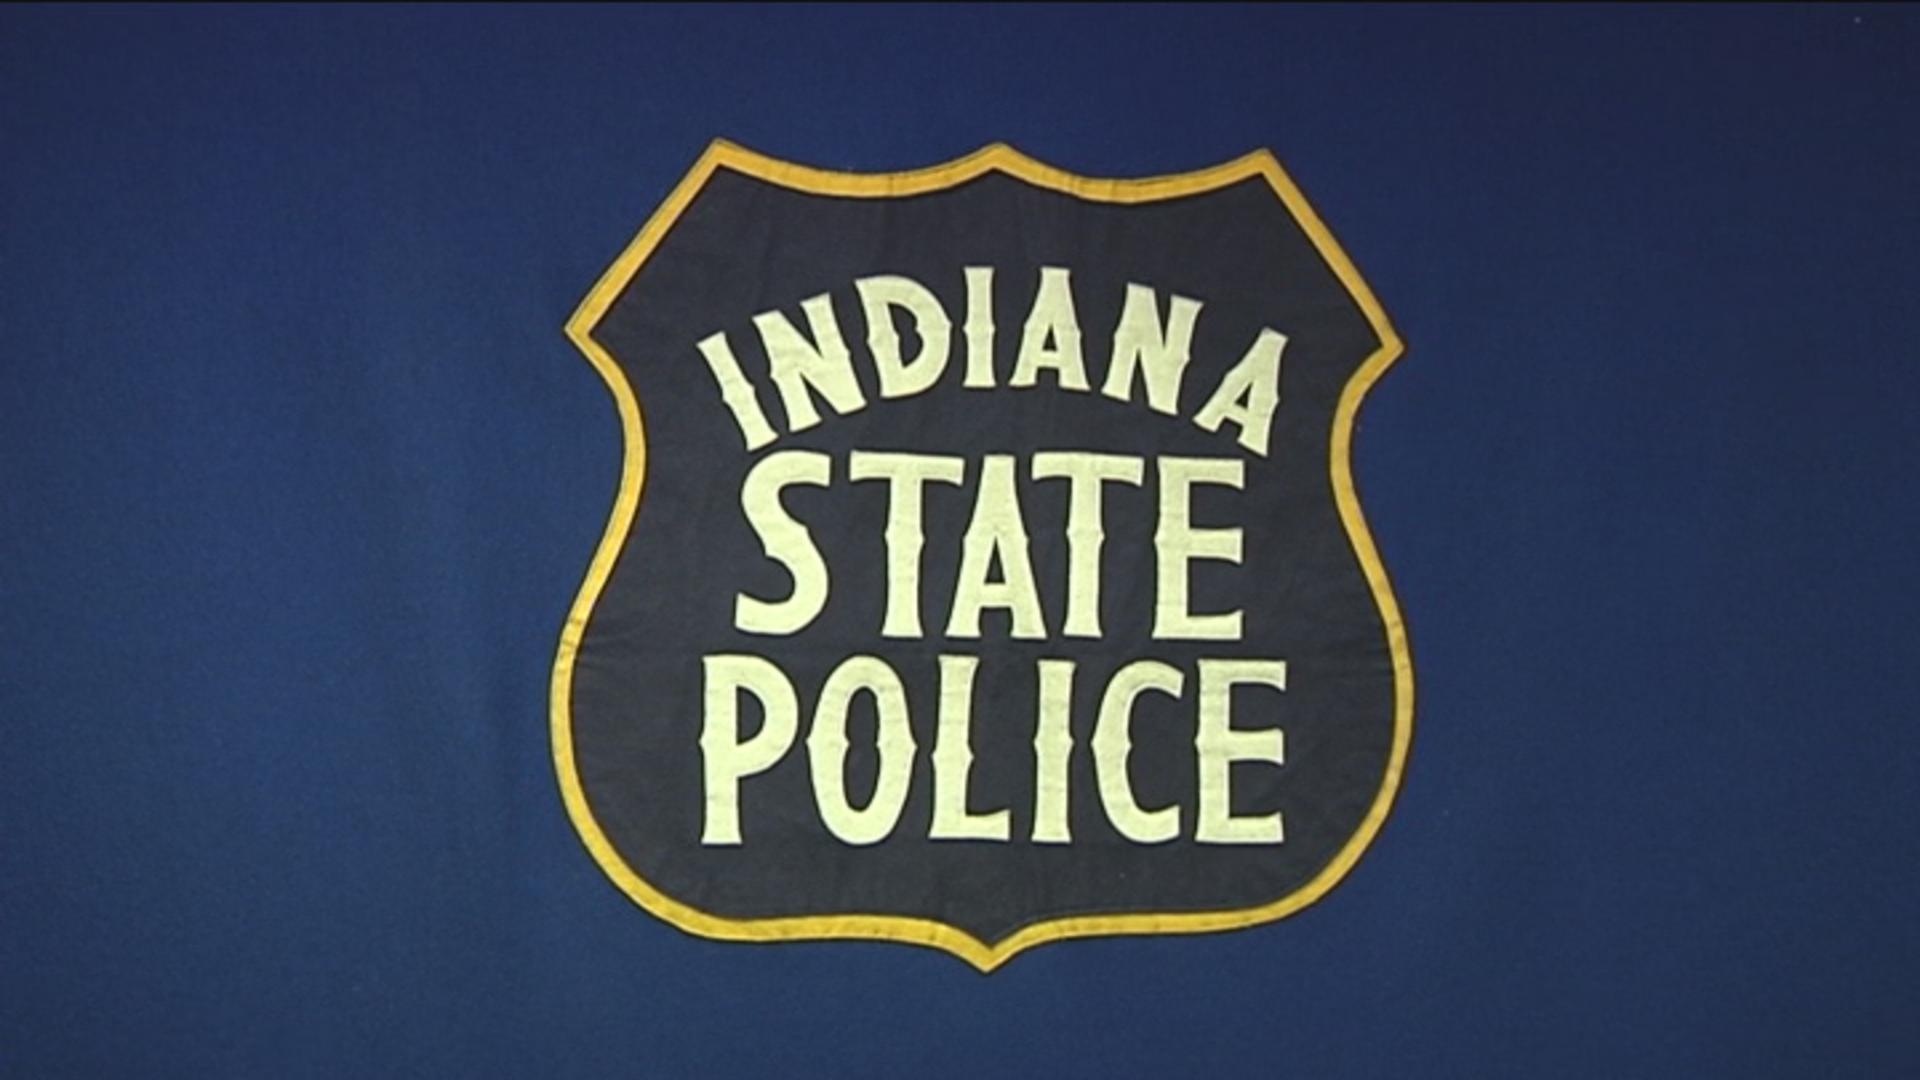 Indiana State Police logo.jpg